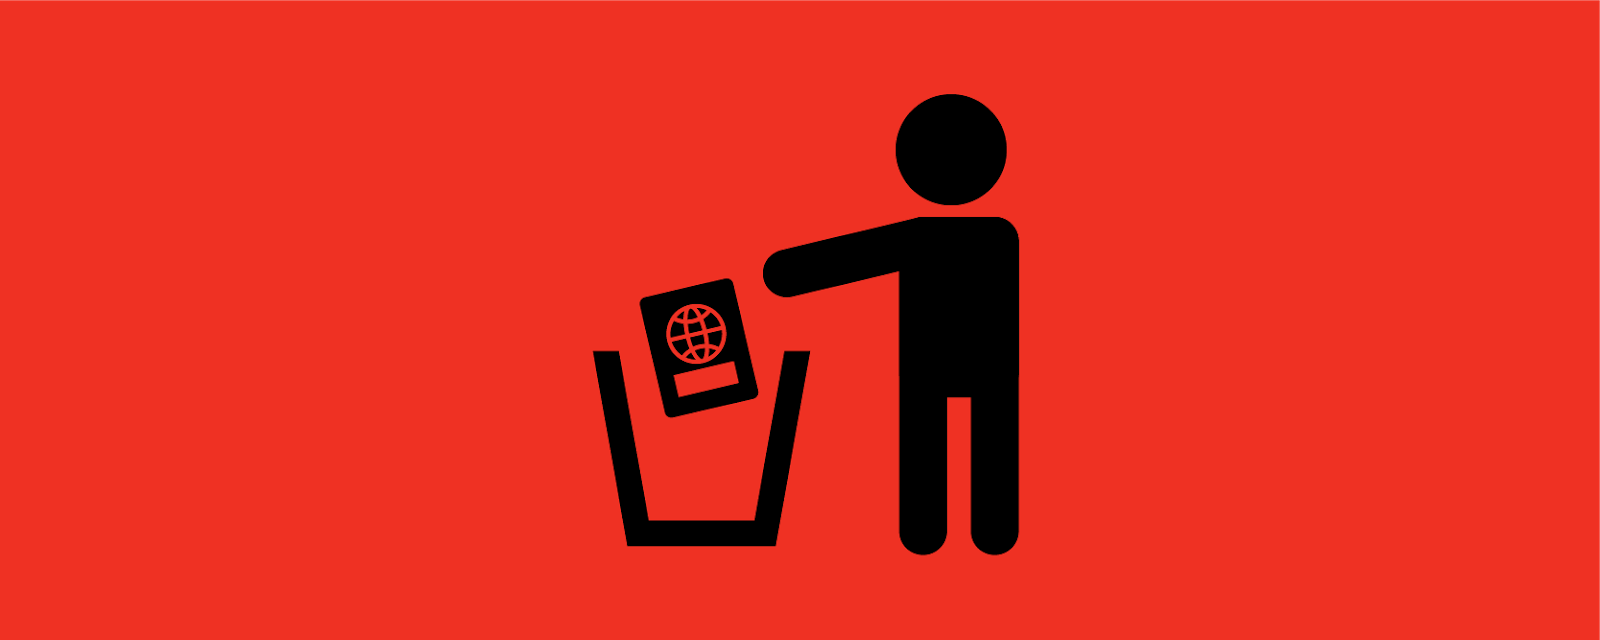 Daftar Shutterstock Sudah Tidak Perlu Pakai Paspor Lagi! Beneran!